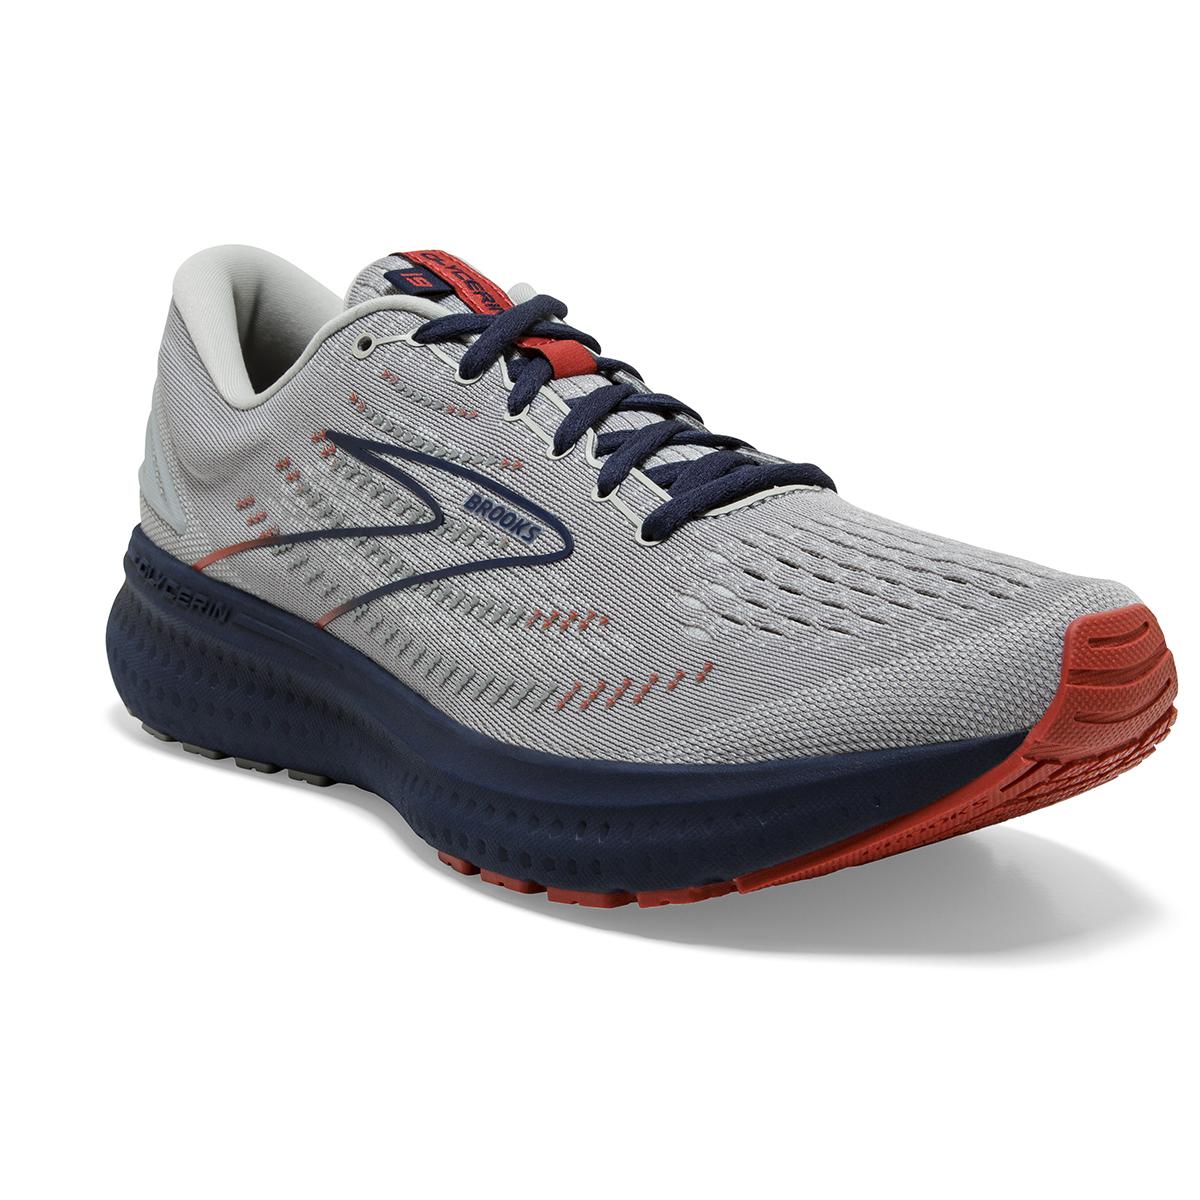 Men's Brooks Glycerin 19 Running Shoe - Color: Grey/Alloy/Peacoat - Size: 7 - Width: Regular, Grey/Alloy/Peacoat, large, image 2